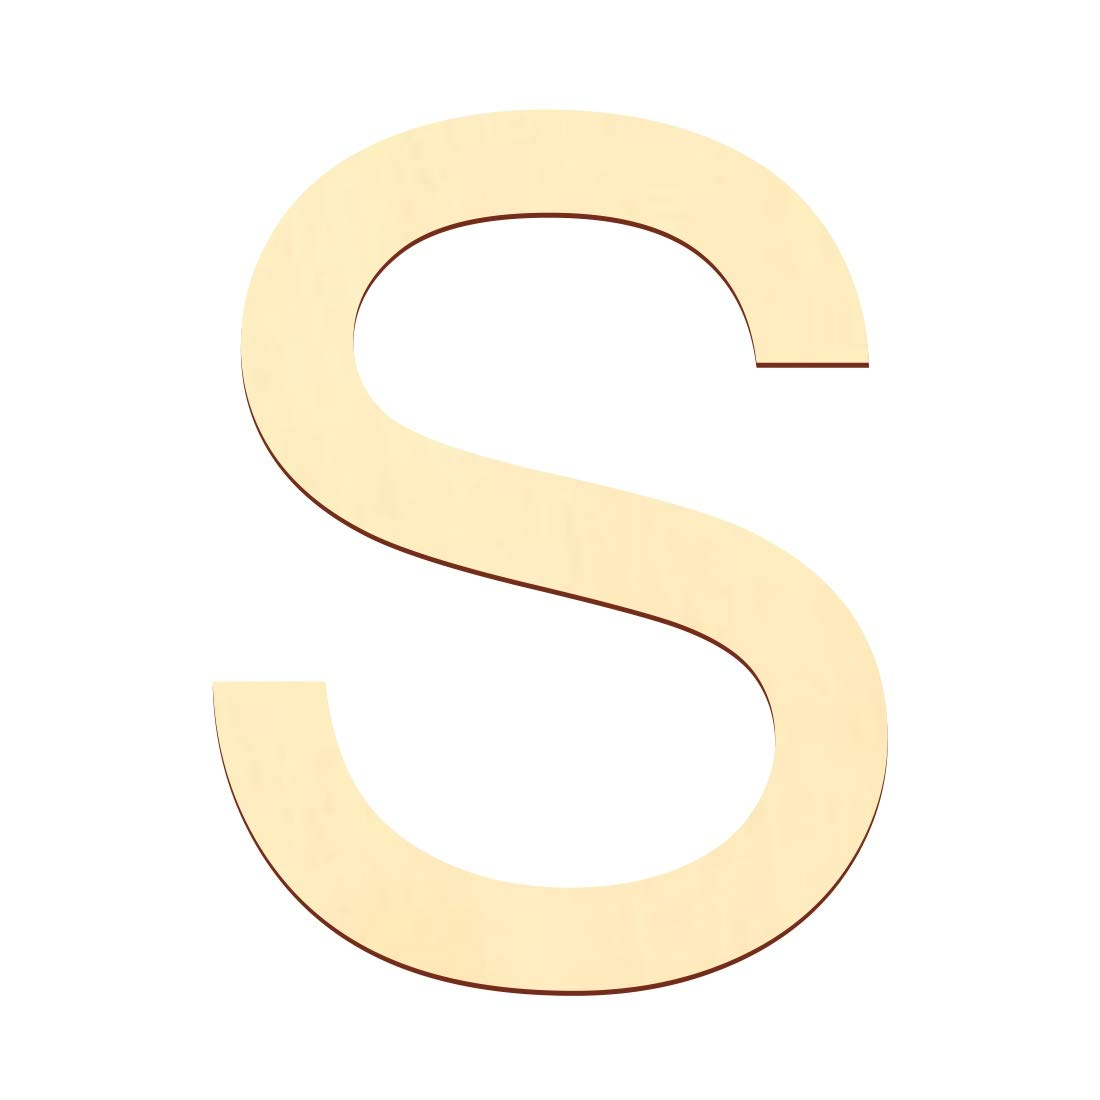 Wunschtext//Schriftzug mit Gr/ö/ßenauswahl Arial B/ütic GmbH Holz Buchstaben Gr/ö/ße:5cm Buchstaben:gro/ßes A